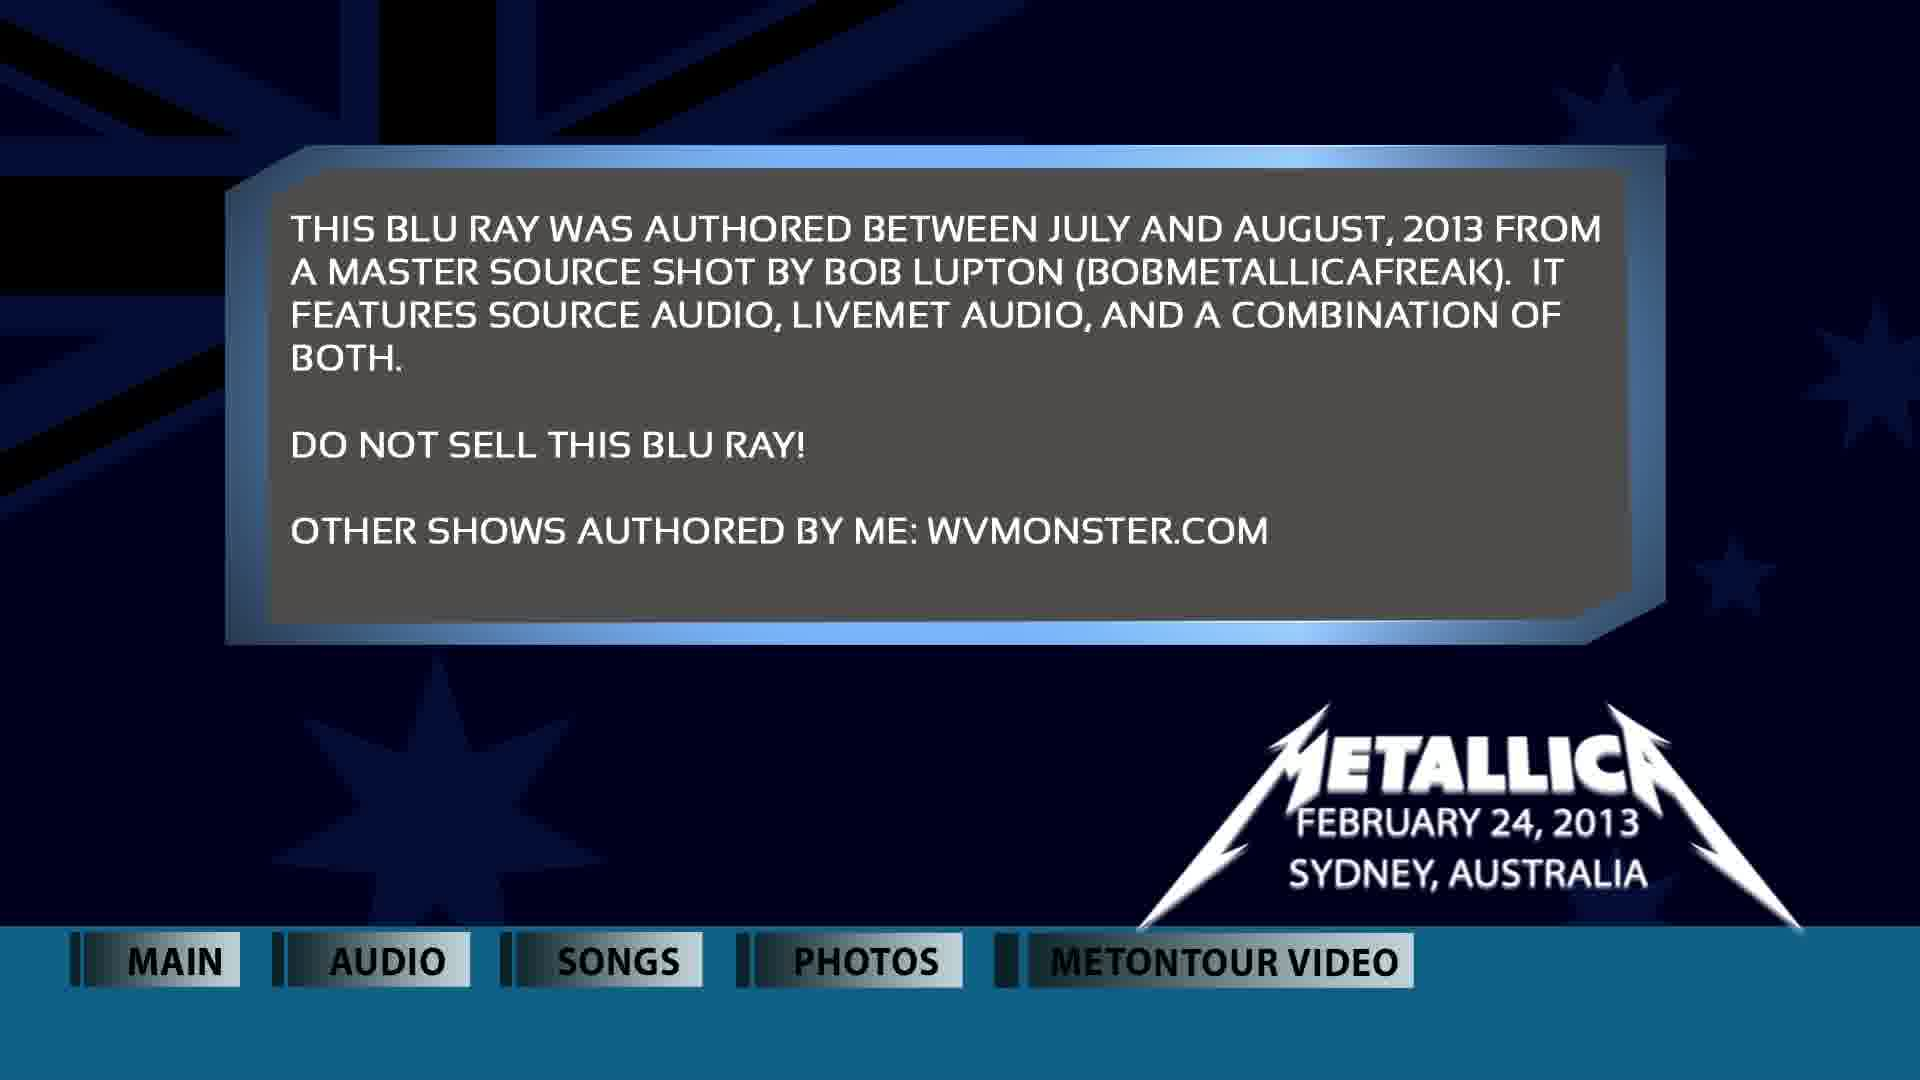 metallica_2013-02-24_sydneyaustralia_screen_21378223635